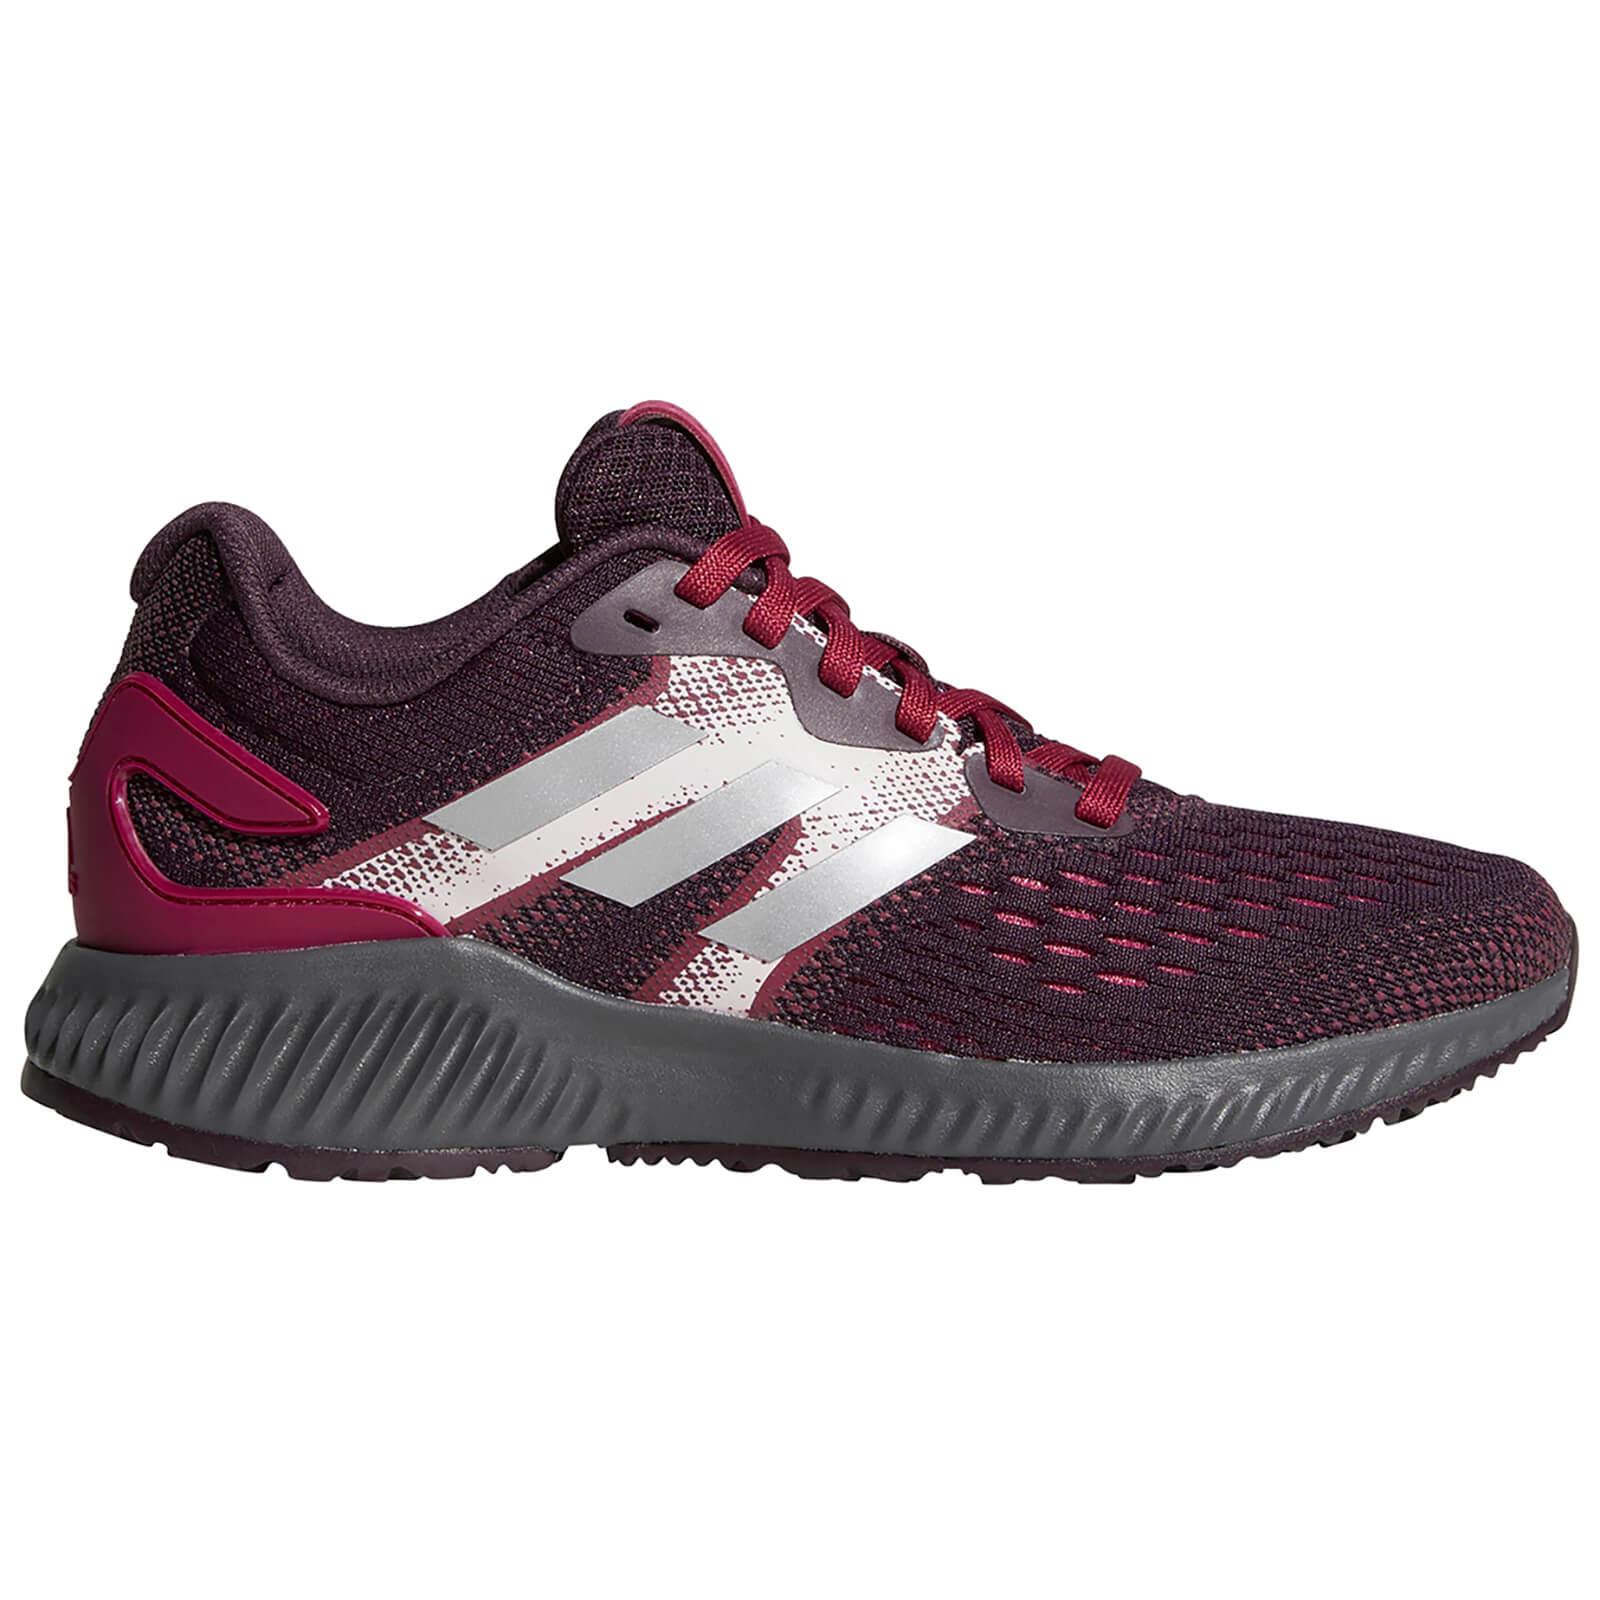 adidas Women's Aerobounce Training Shoes - Purple - US 8/UK 6.5 - Purple